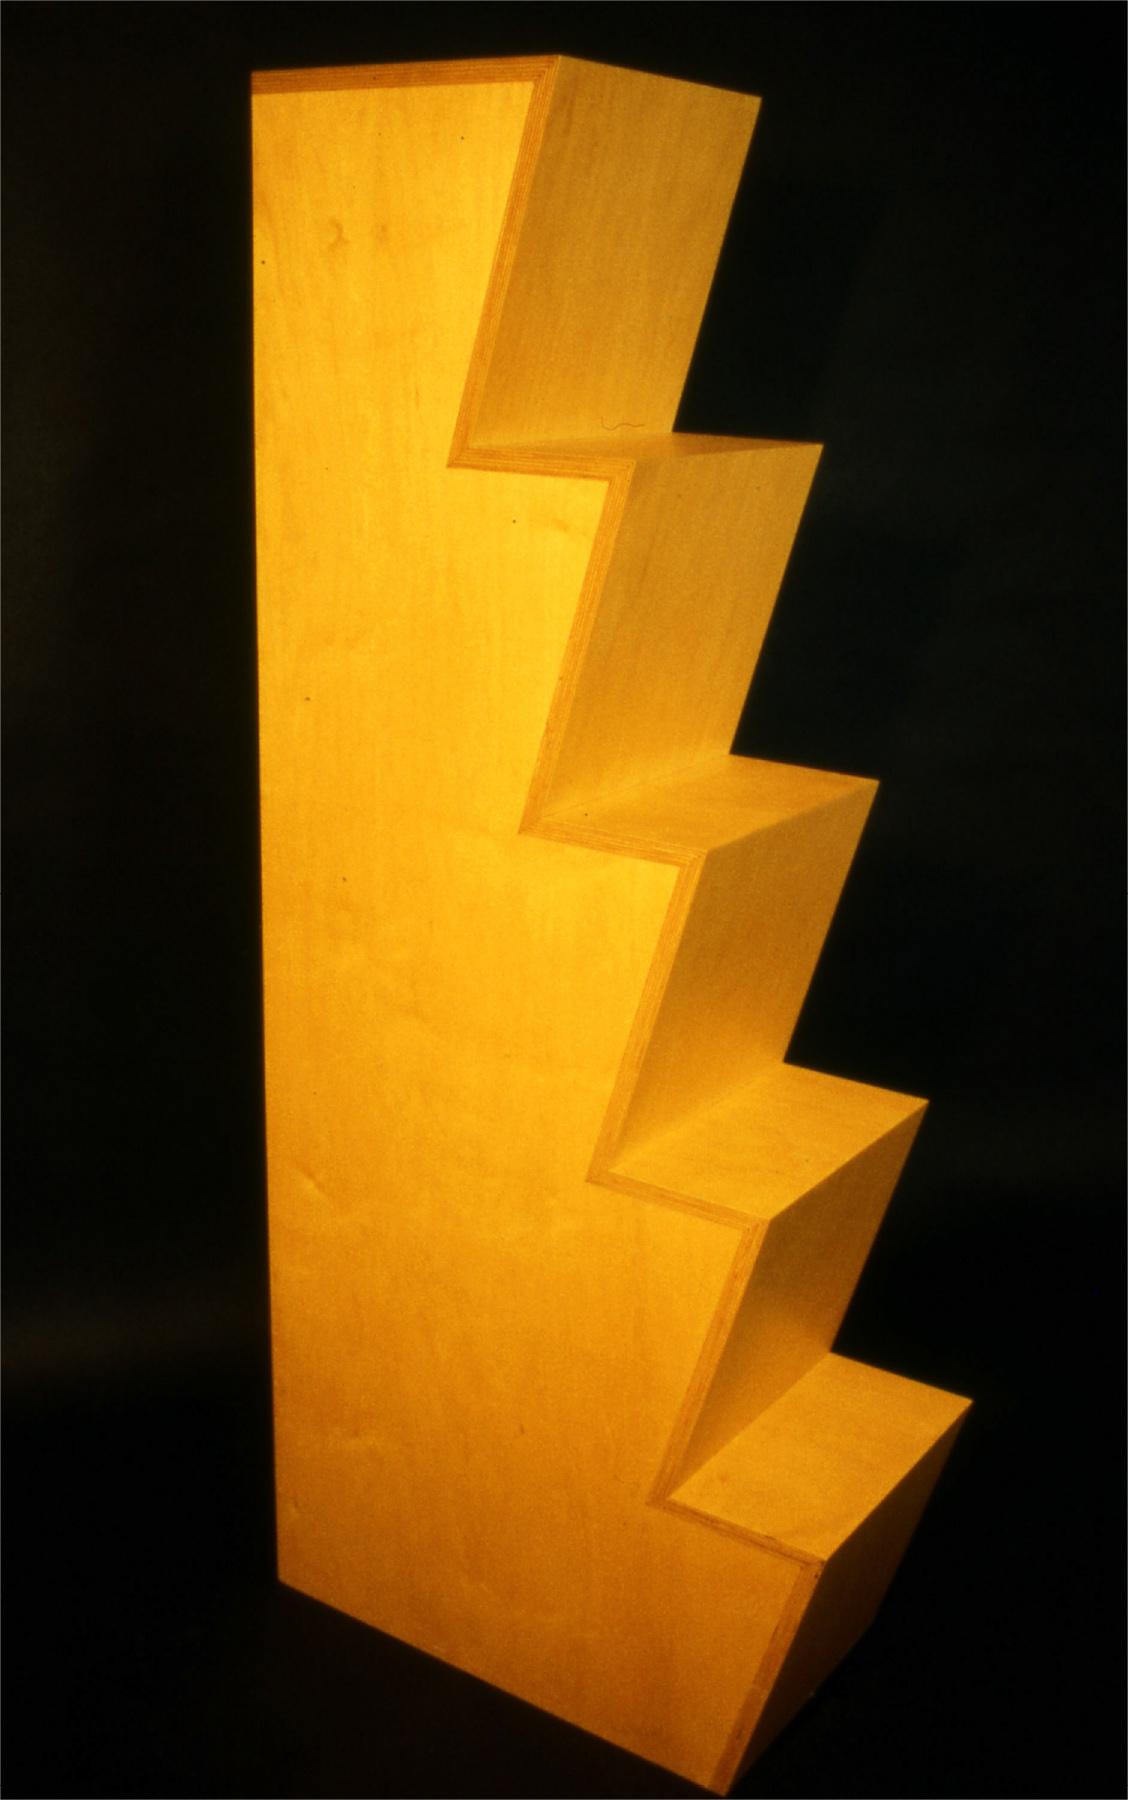 Furniture Glyph Stair Cabinet 2a.jpg